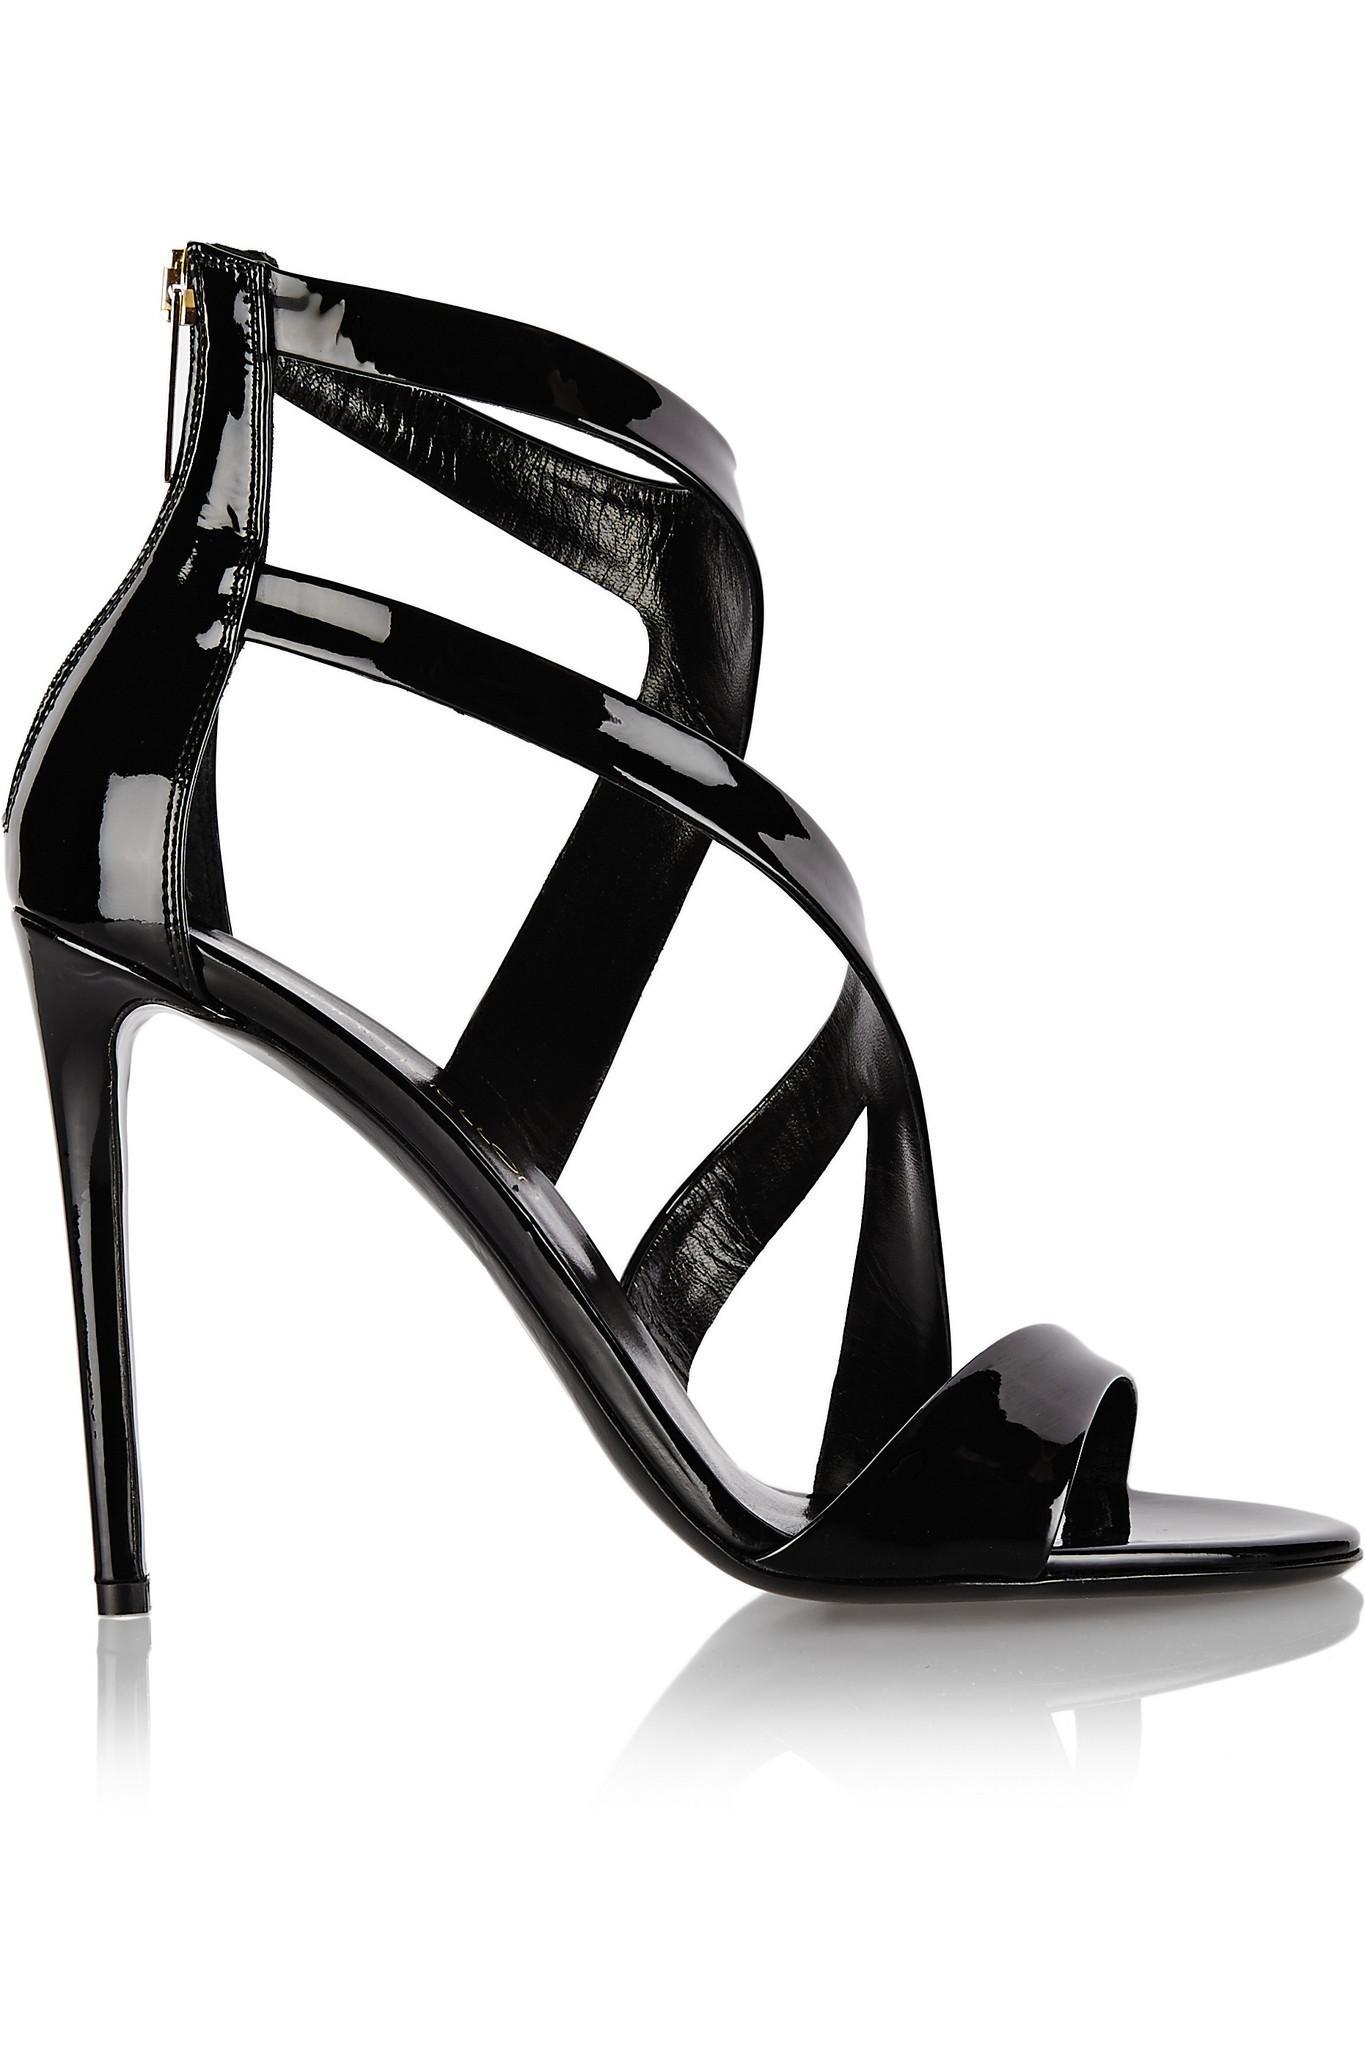 Tamara Mellon Tiger Burgundy Patent Sandals 105MM Heels $795 NEW